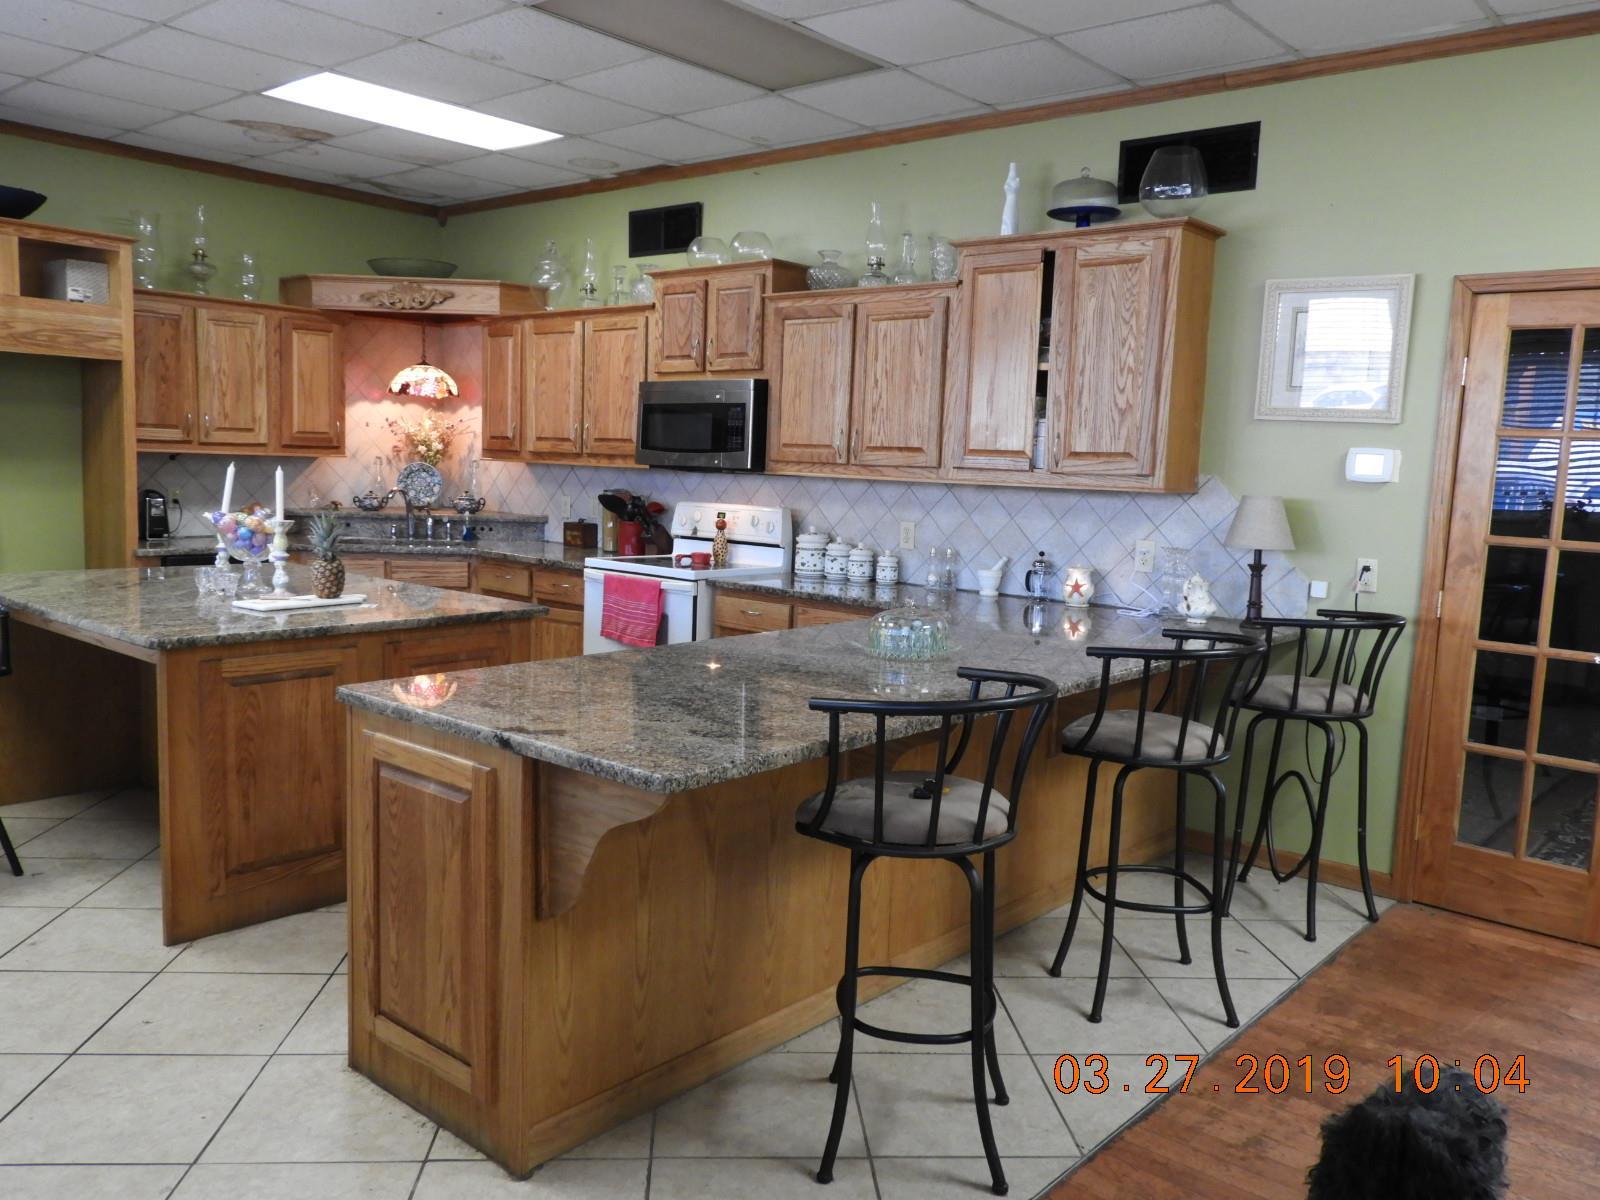 319 N 1St St, Pulaski, TN 38478 - Pulaski, TN real estate listing